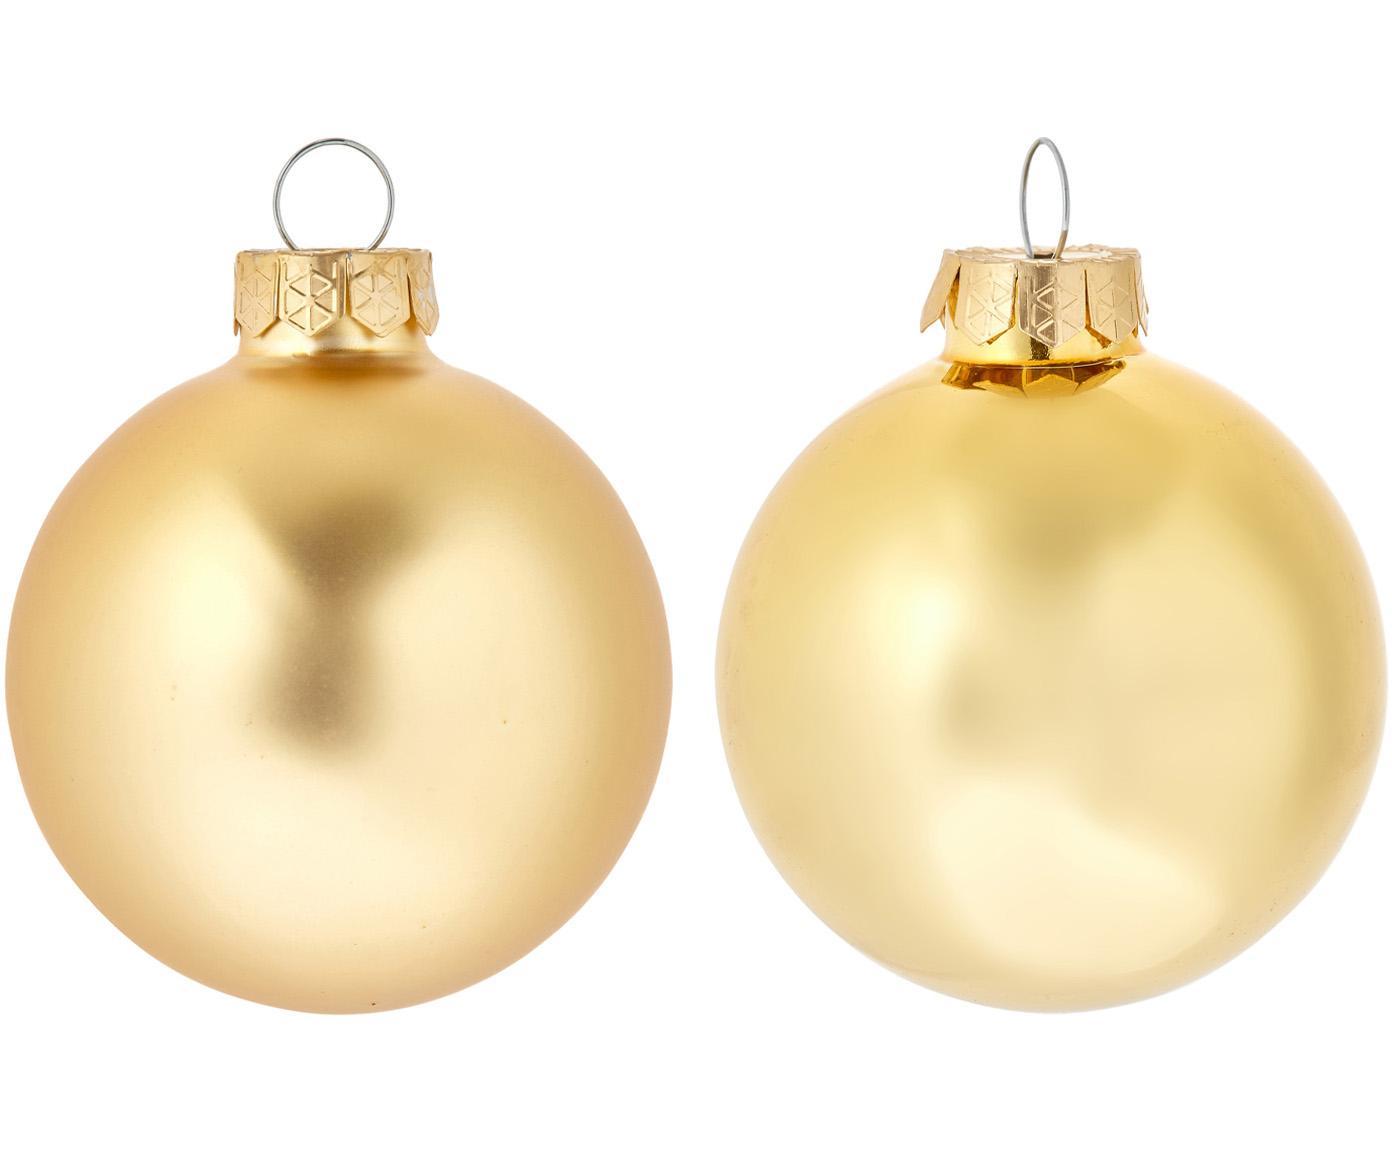 Weihnachtskugel-Set EvergreenØ6cm, 10-tlg., Goldfarben, Ø 6 cm